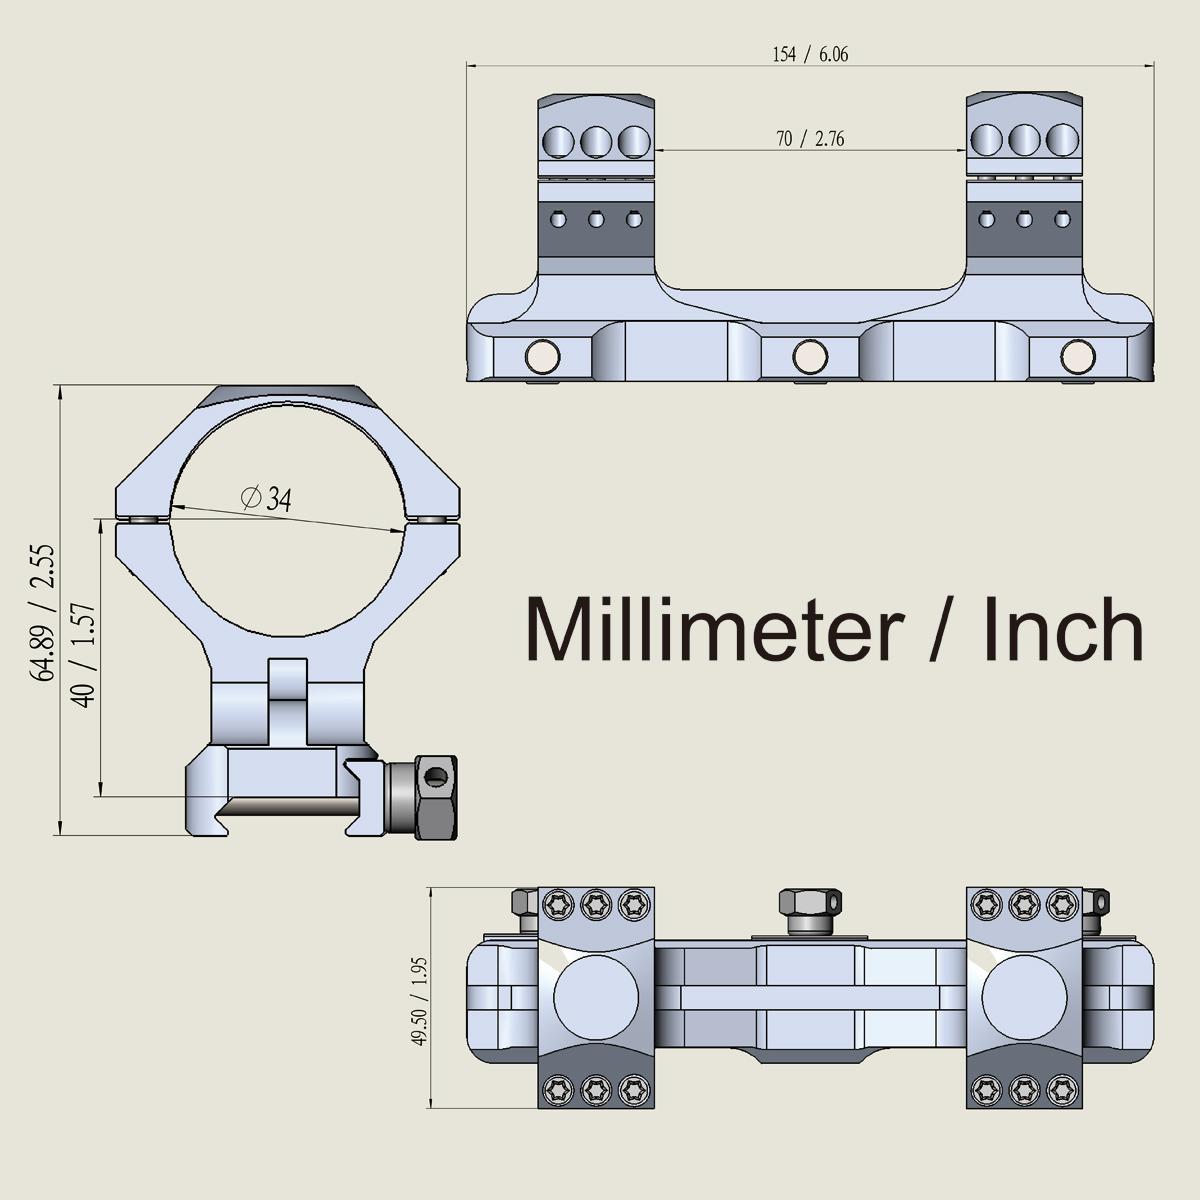 34mm X-Accu One Piece High Picatinny Mount Acom diagram